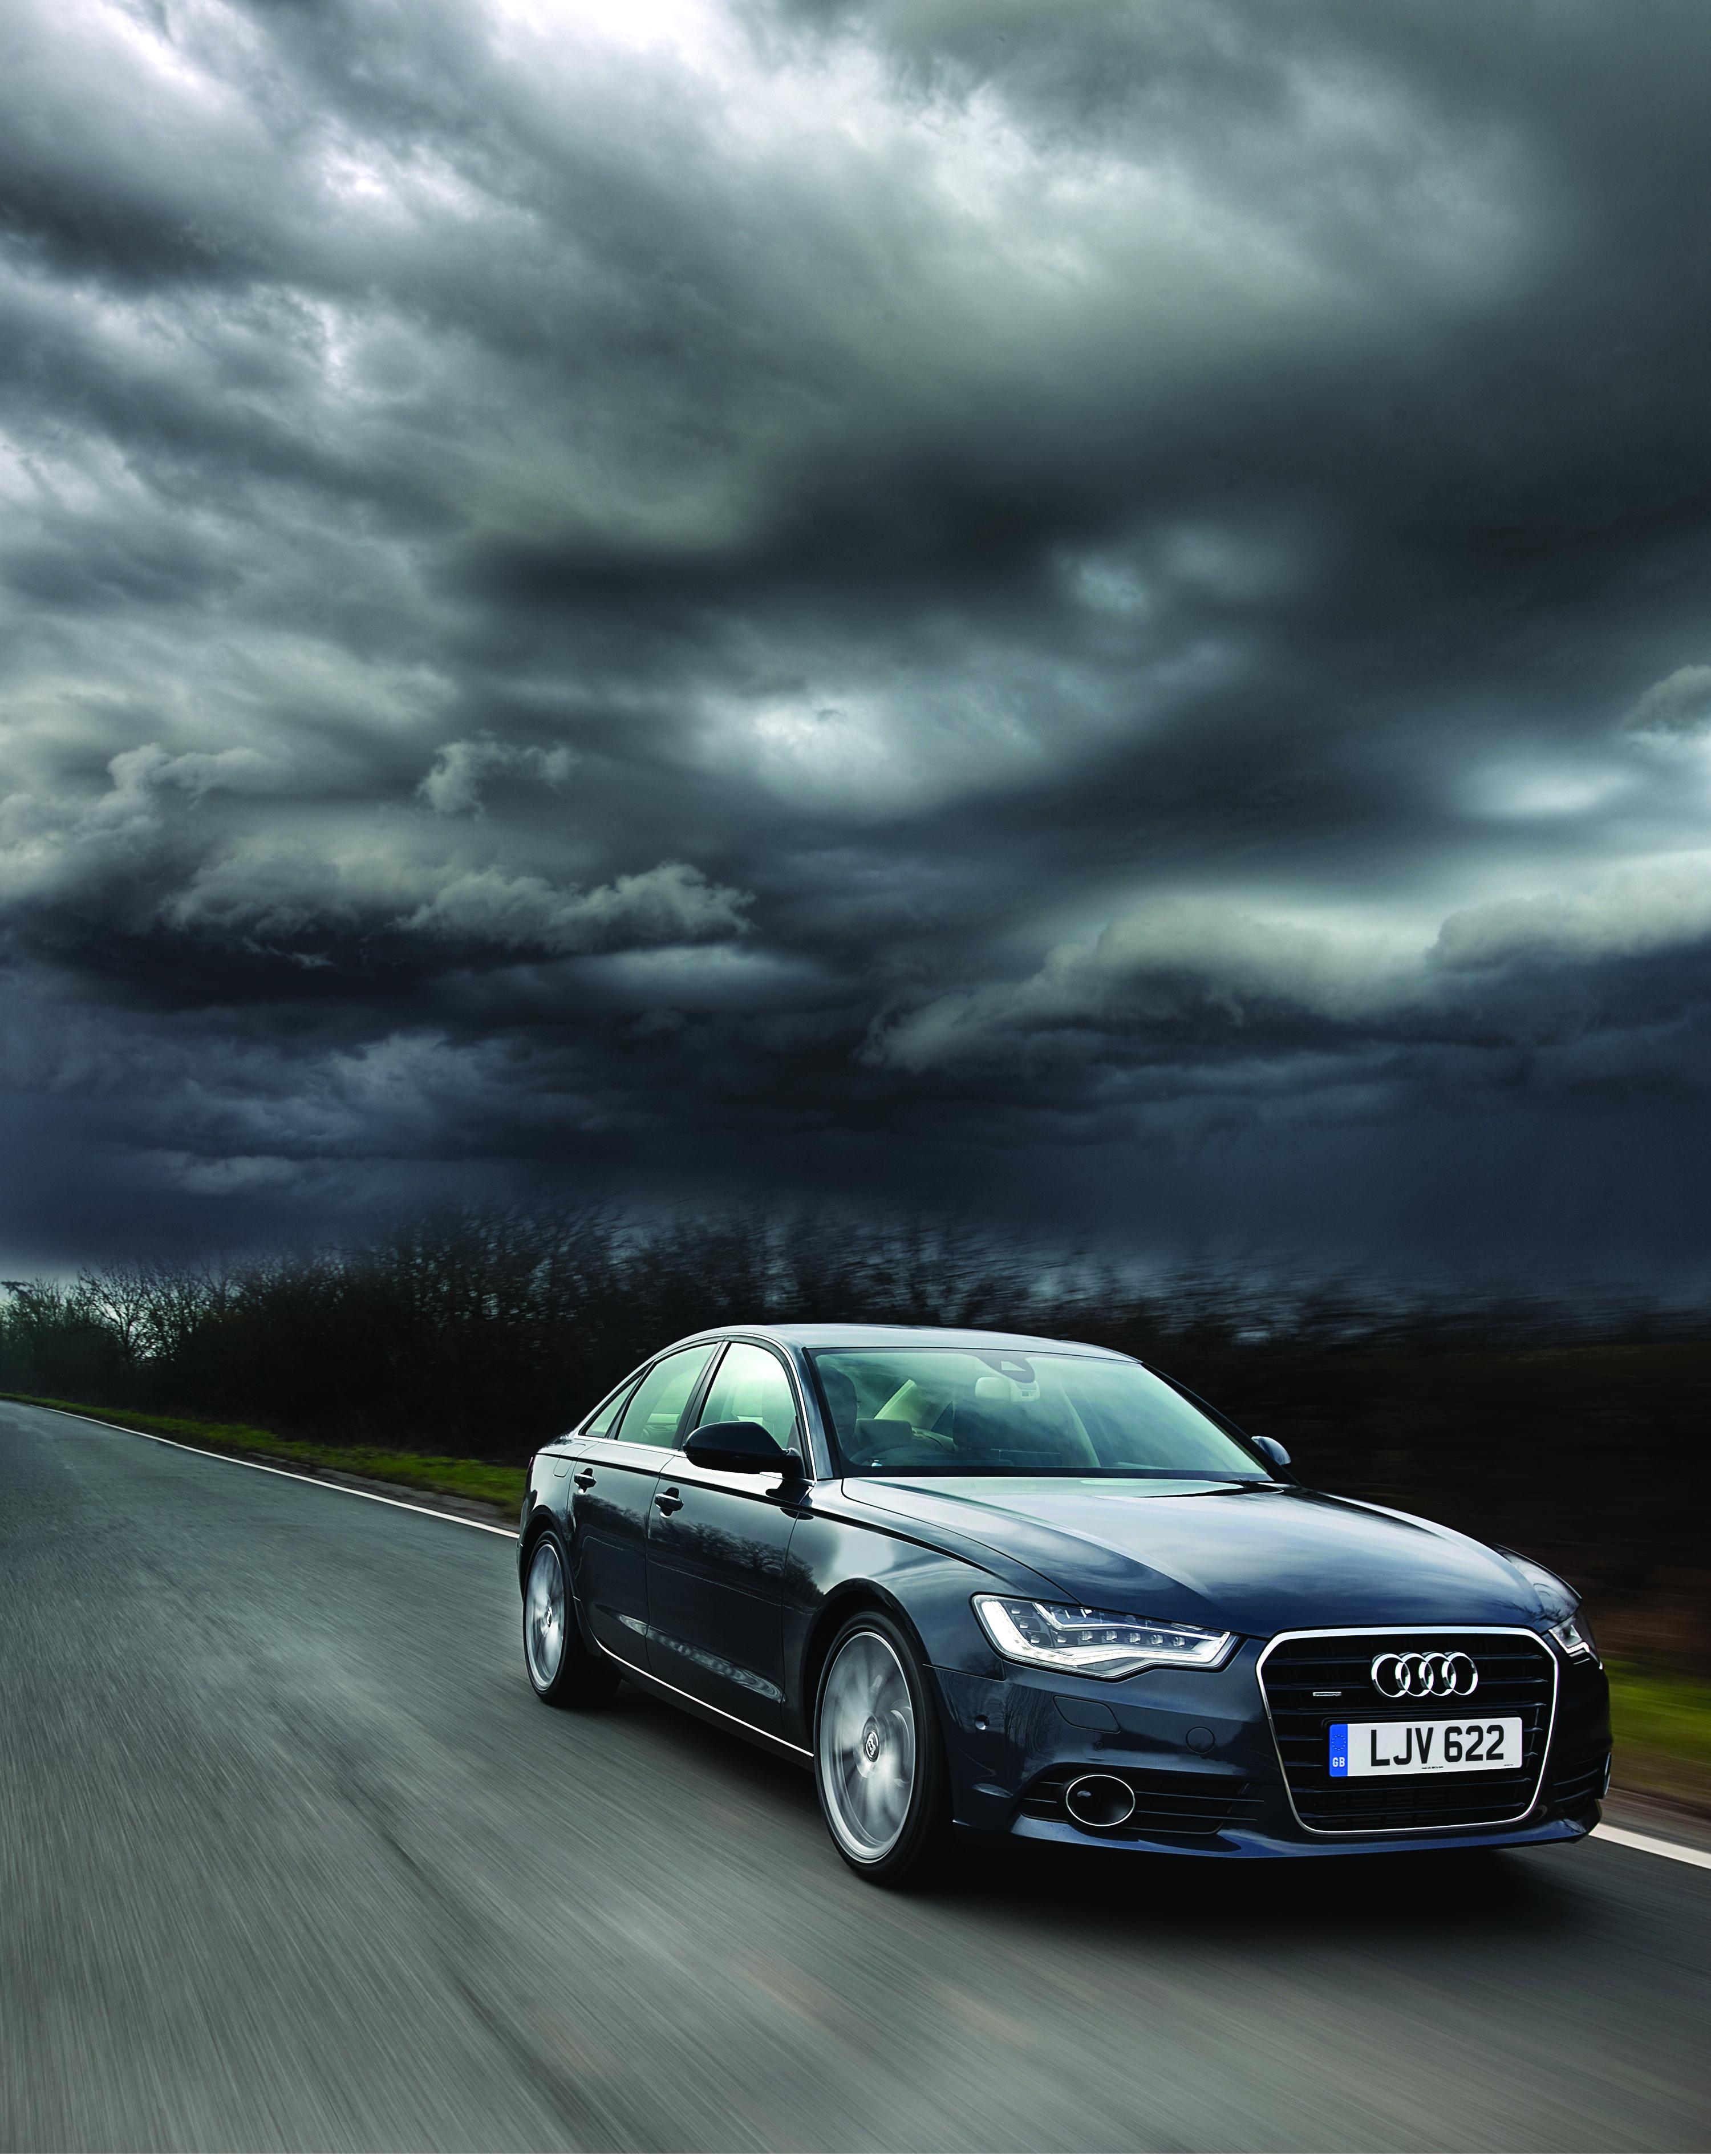 Car Review Audi A A ROCKET PROPELLED CHARIOT OF DREAMS - Audi car reviews